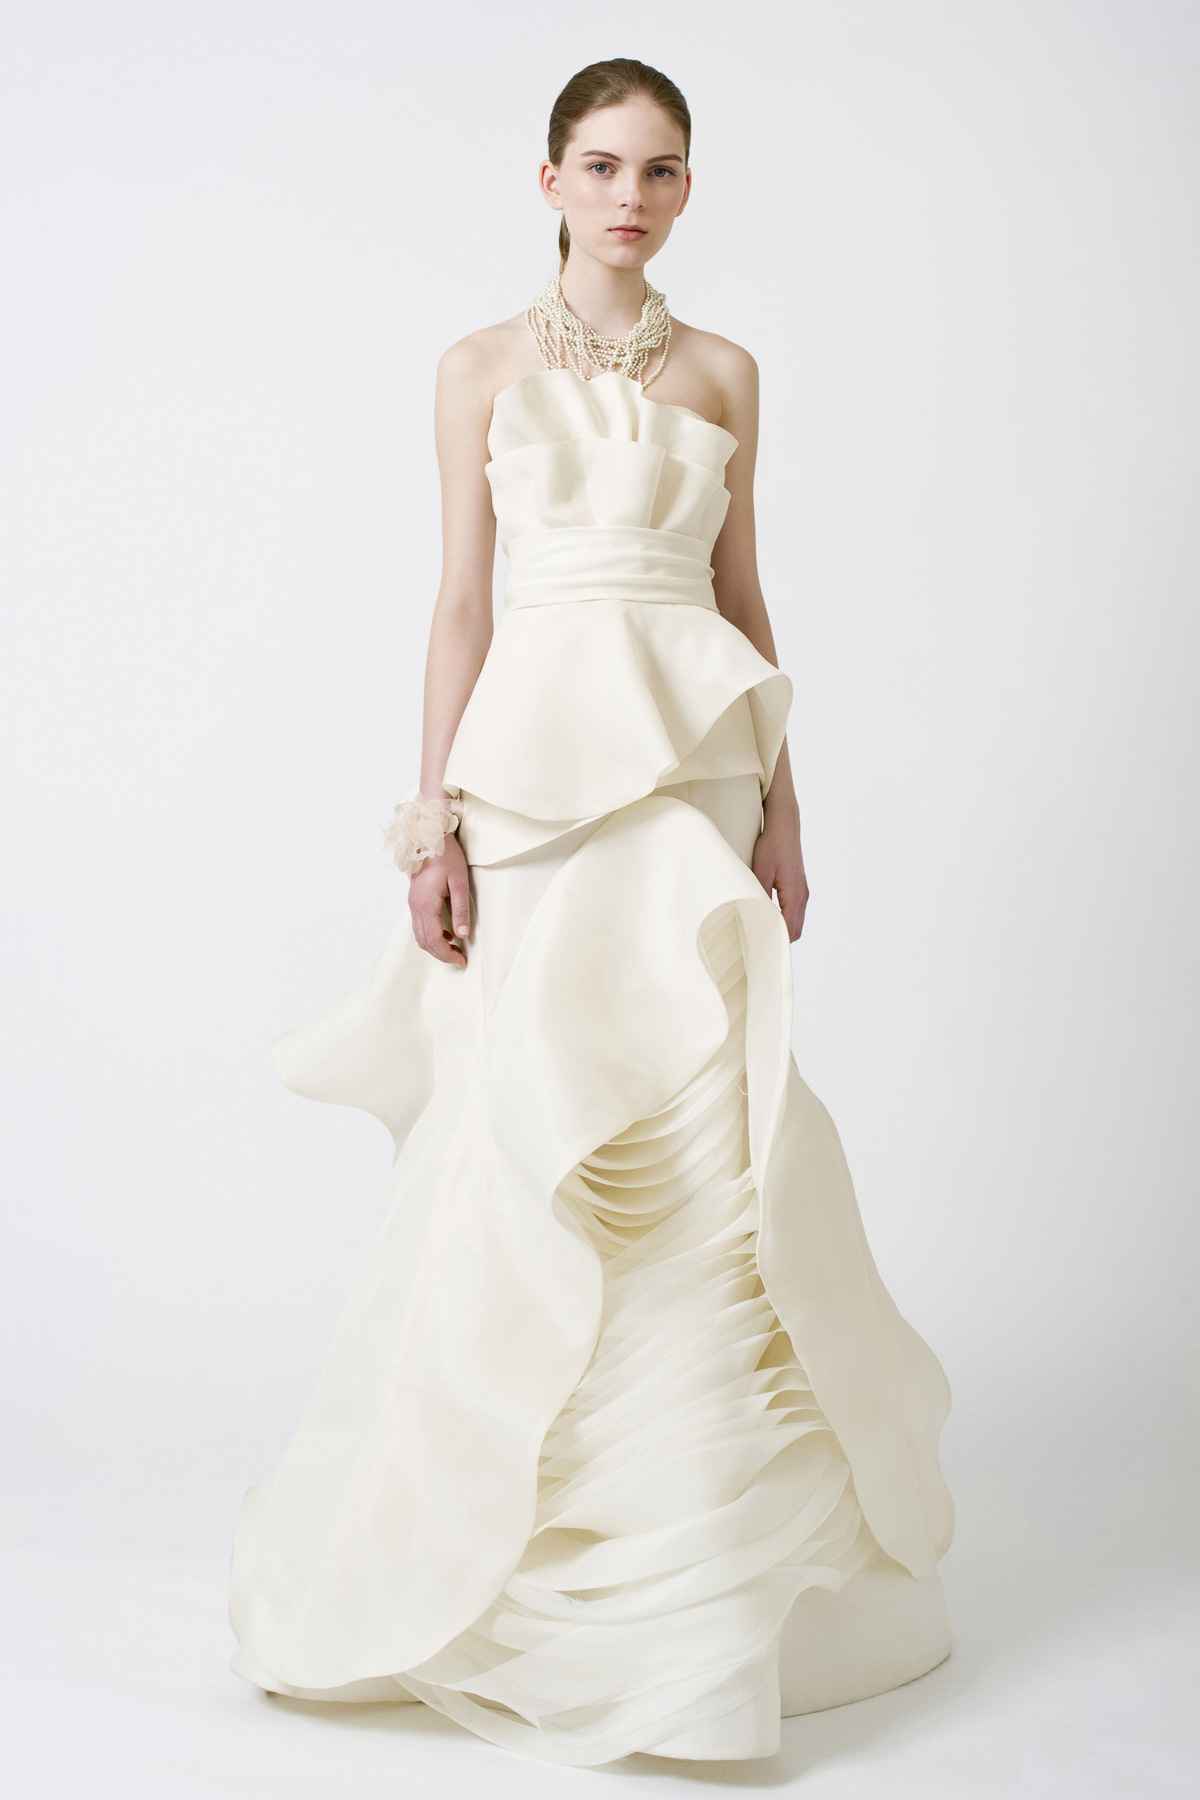 Vera Wang 2011 Spring Bridal Collection – The FashionBrides